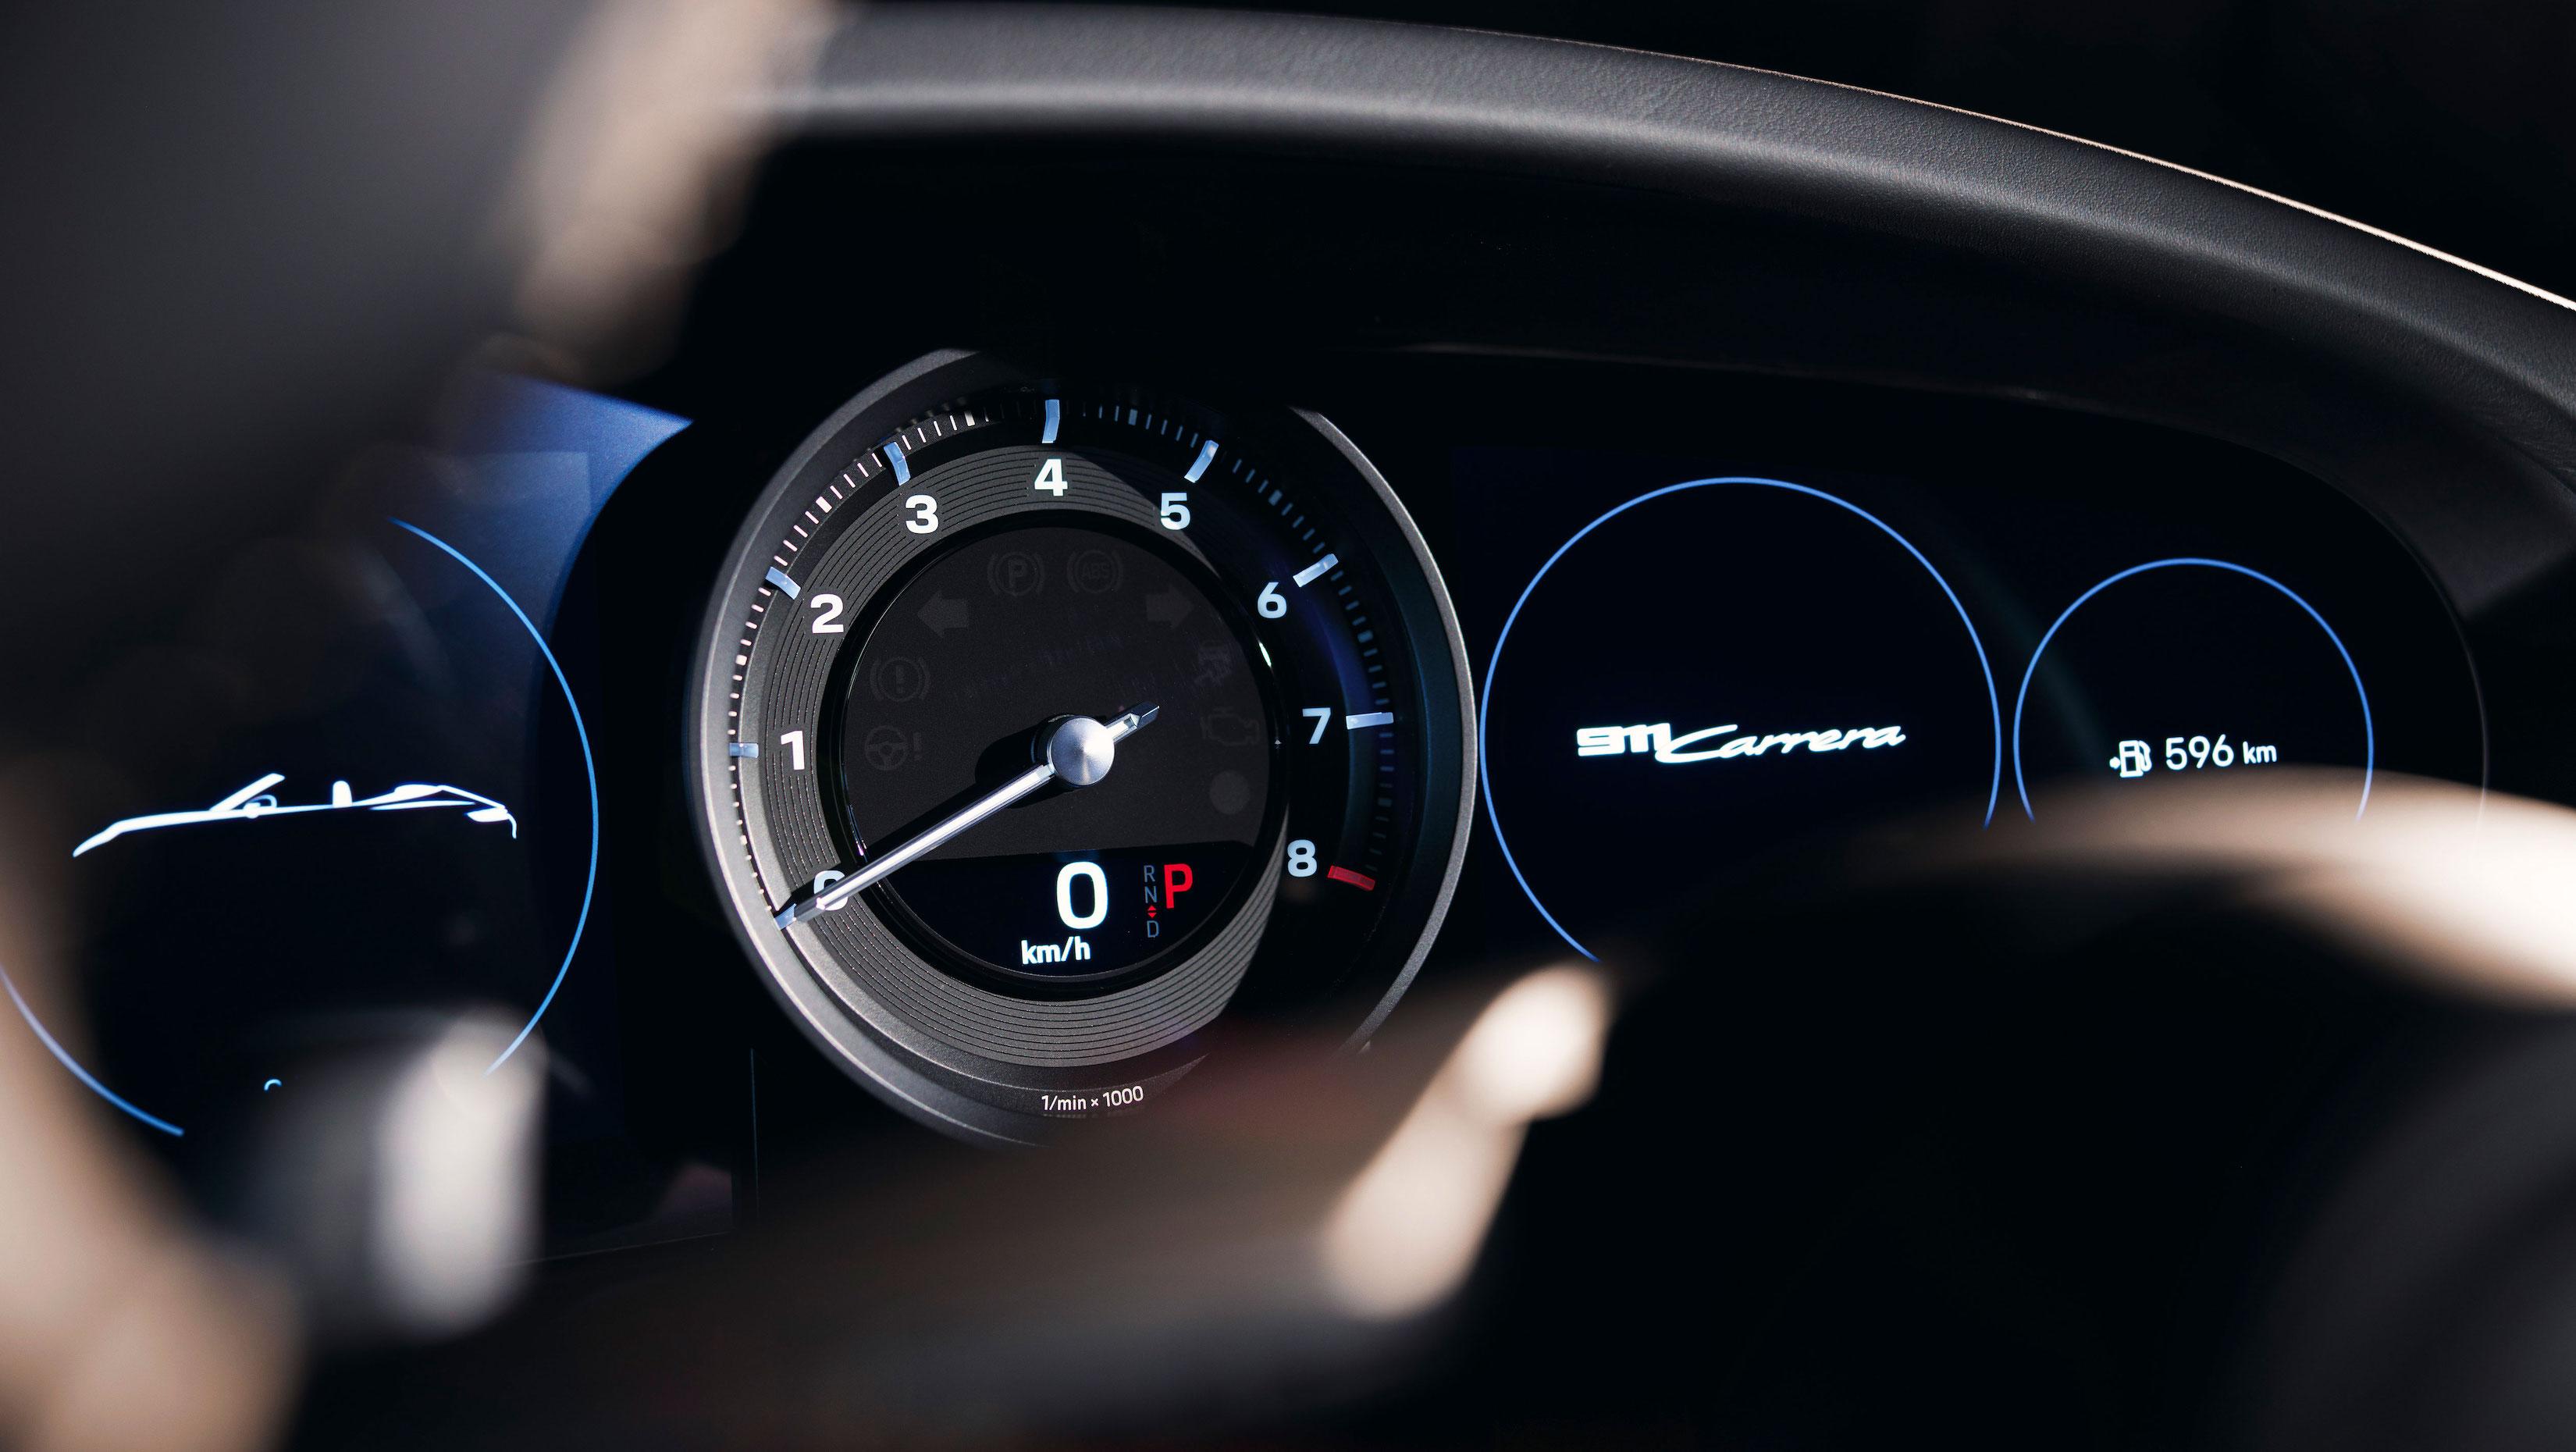 Porsche 911 Carrera gauges